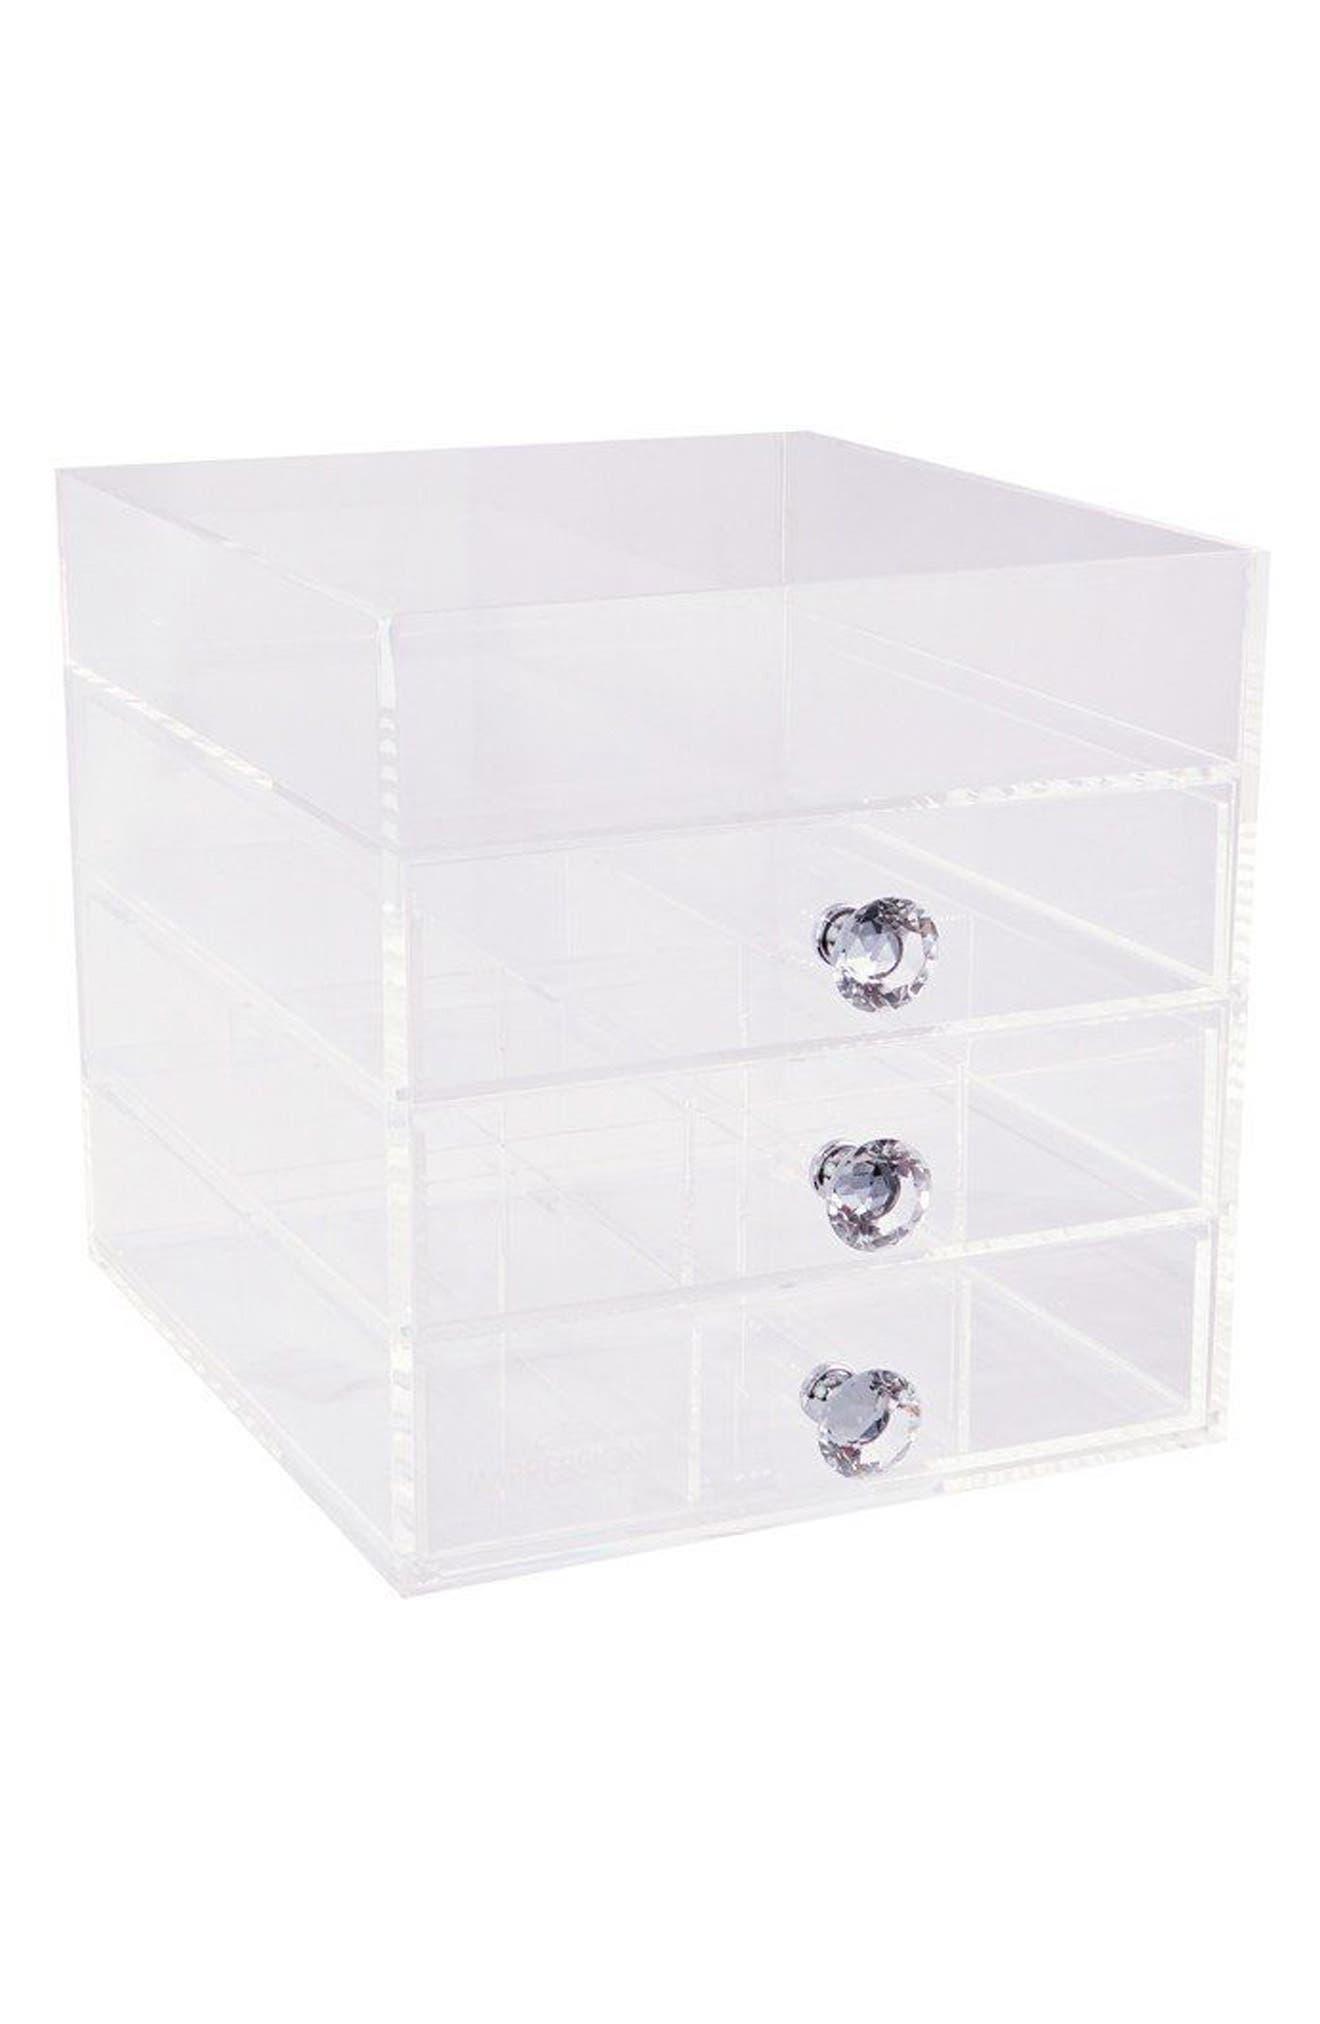 Main Image - Impressions Vanity Co. Diamond Collection 4-Drawer Acrylic Organizer